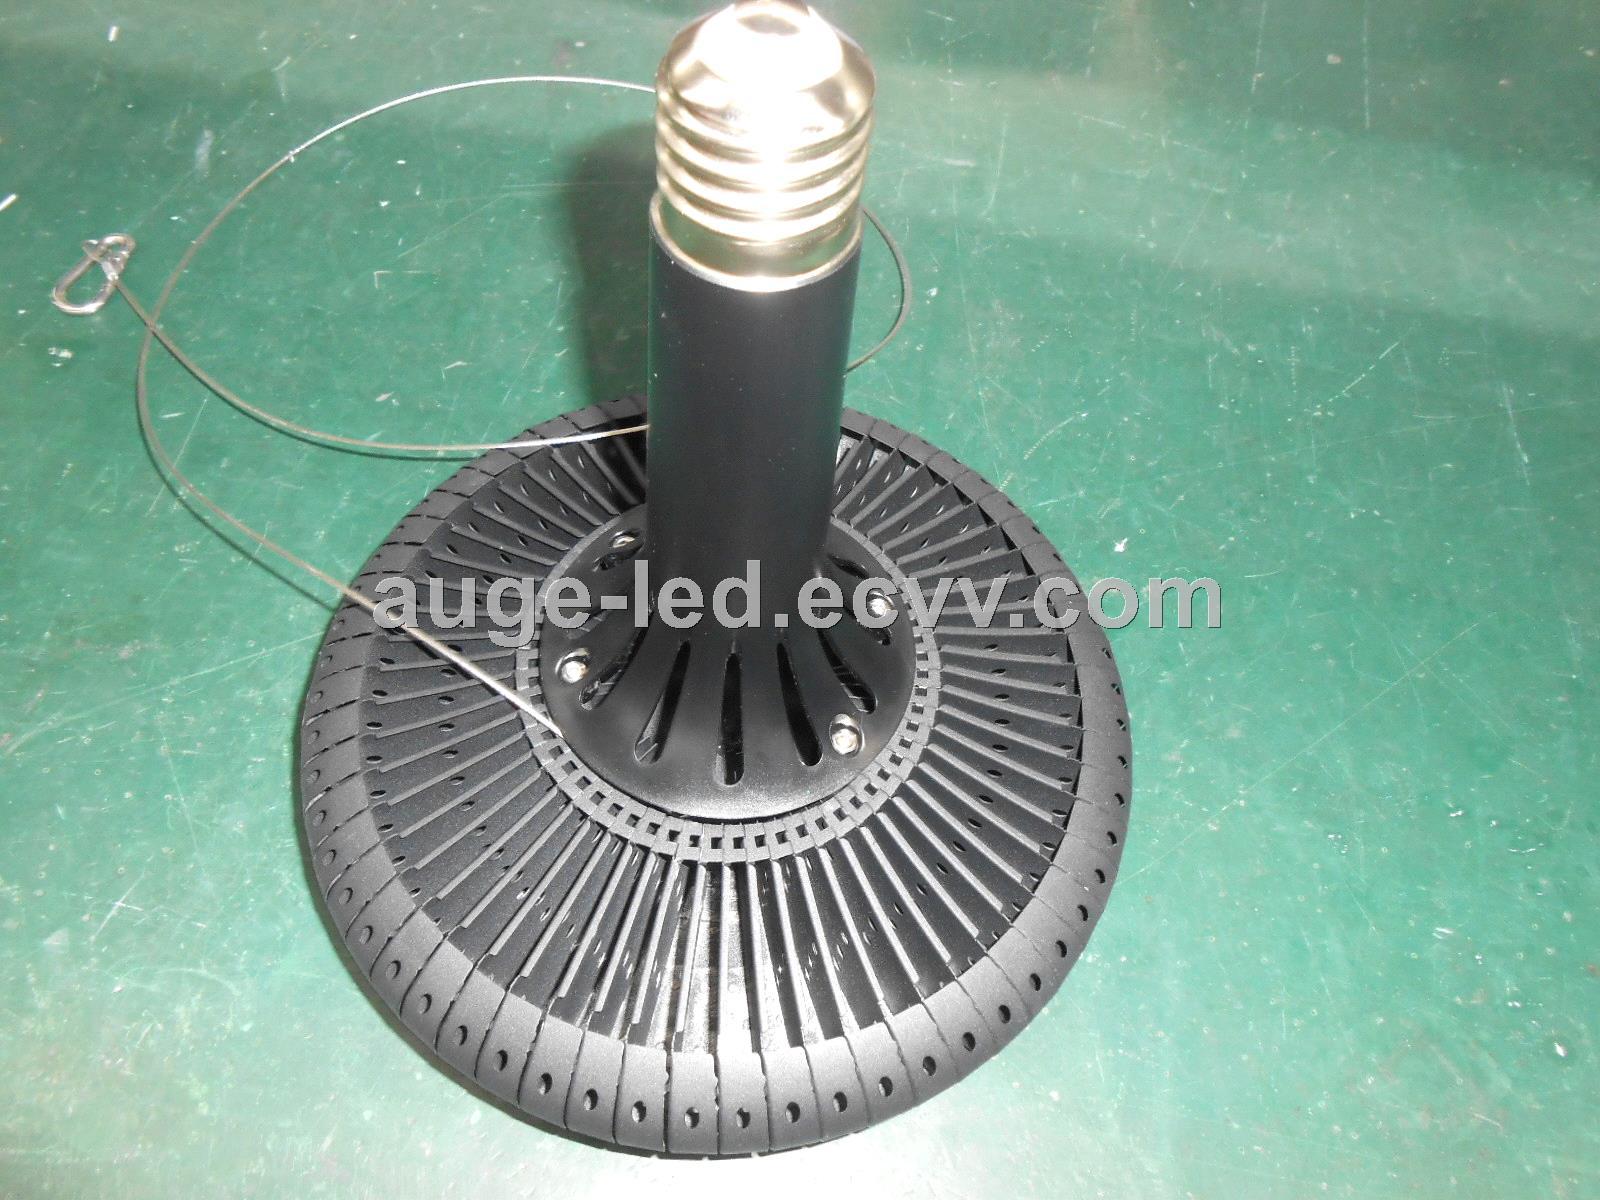 100W 150W UFO High Bay Light AC Linear Driverless UFO High Bay Light IP65 High Bay Light Replace Corn Lamp